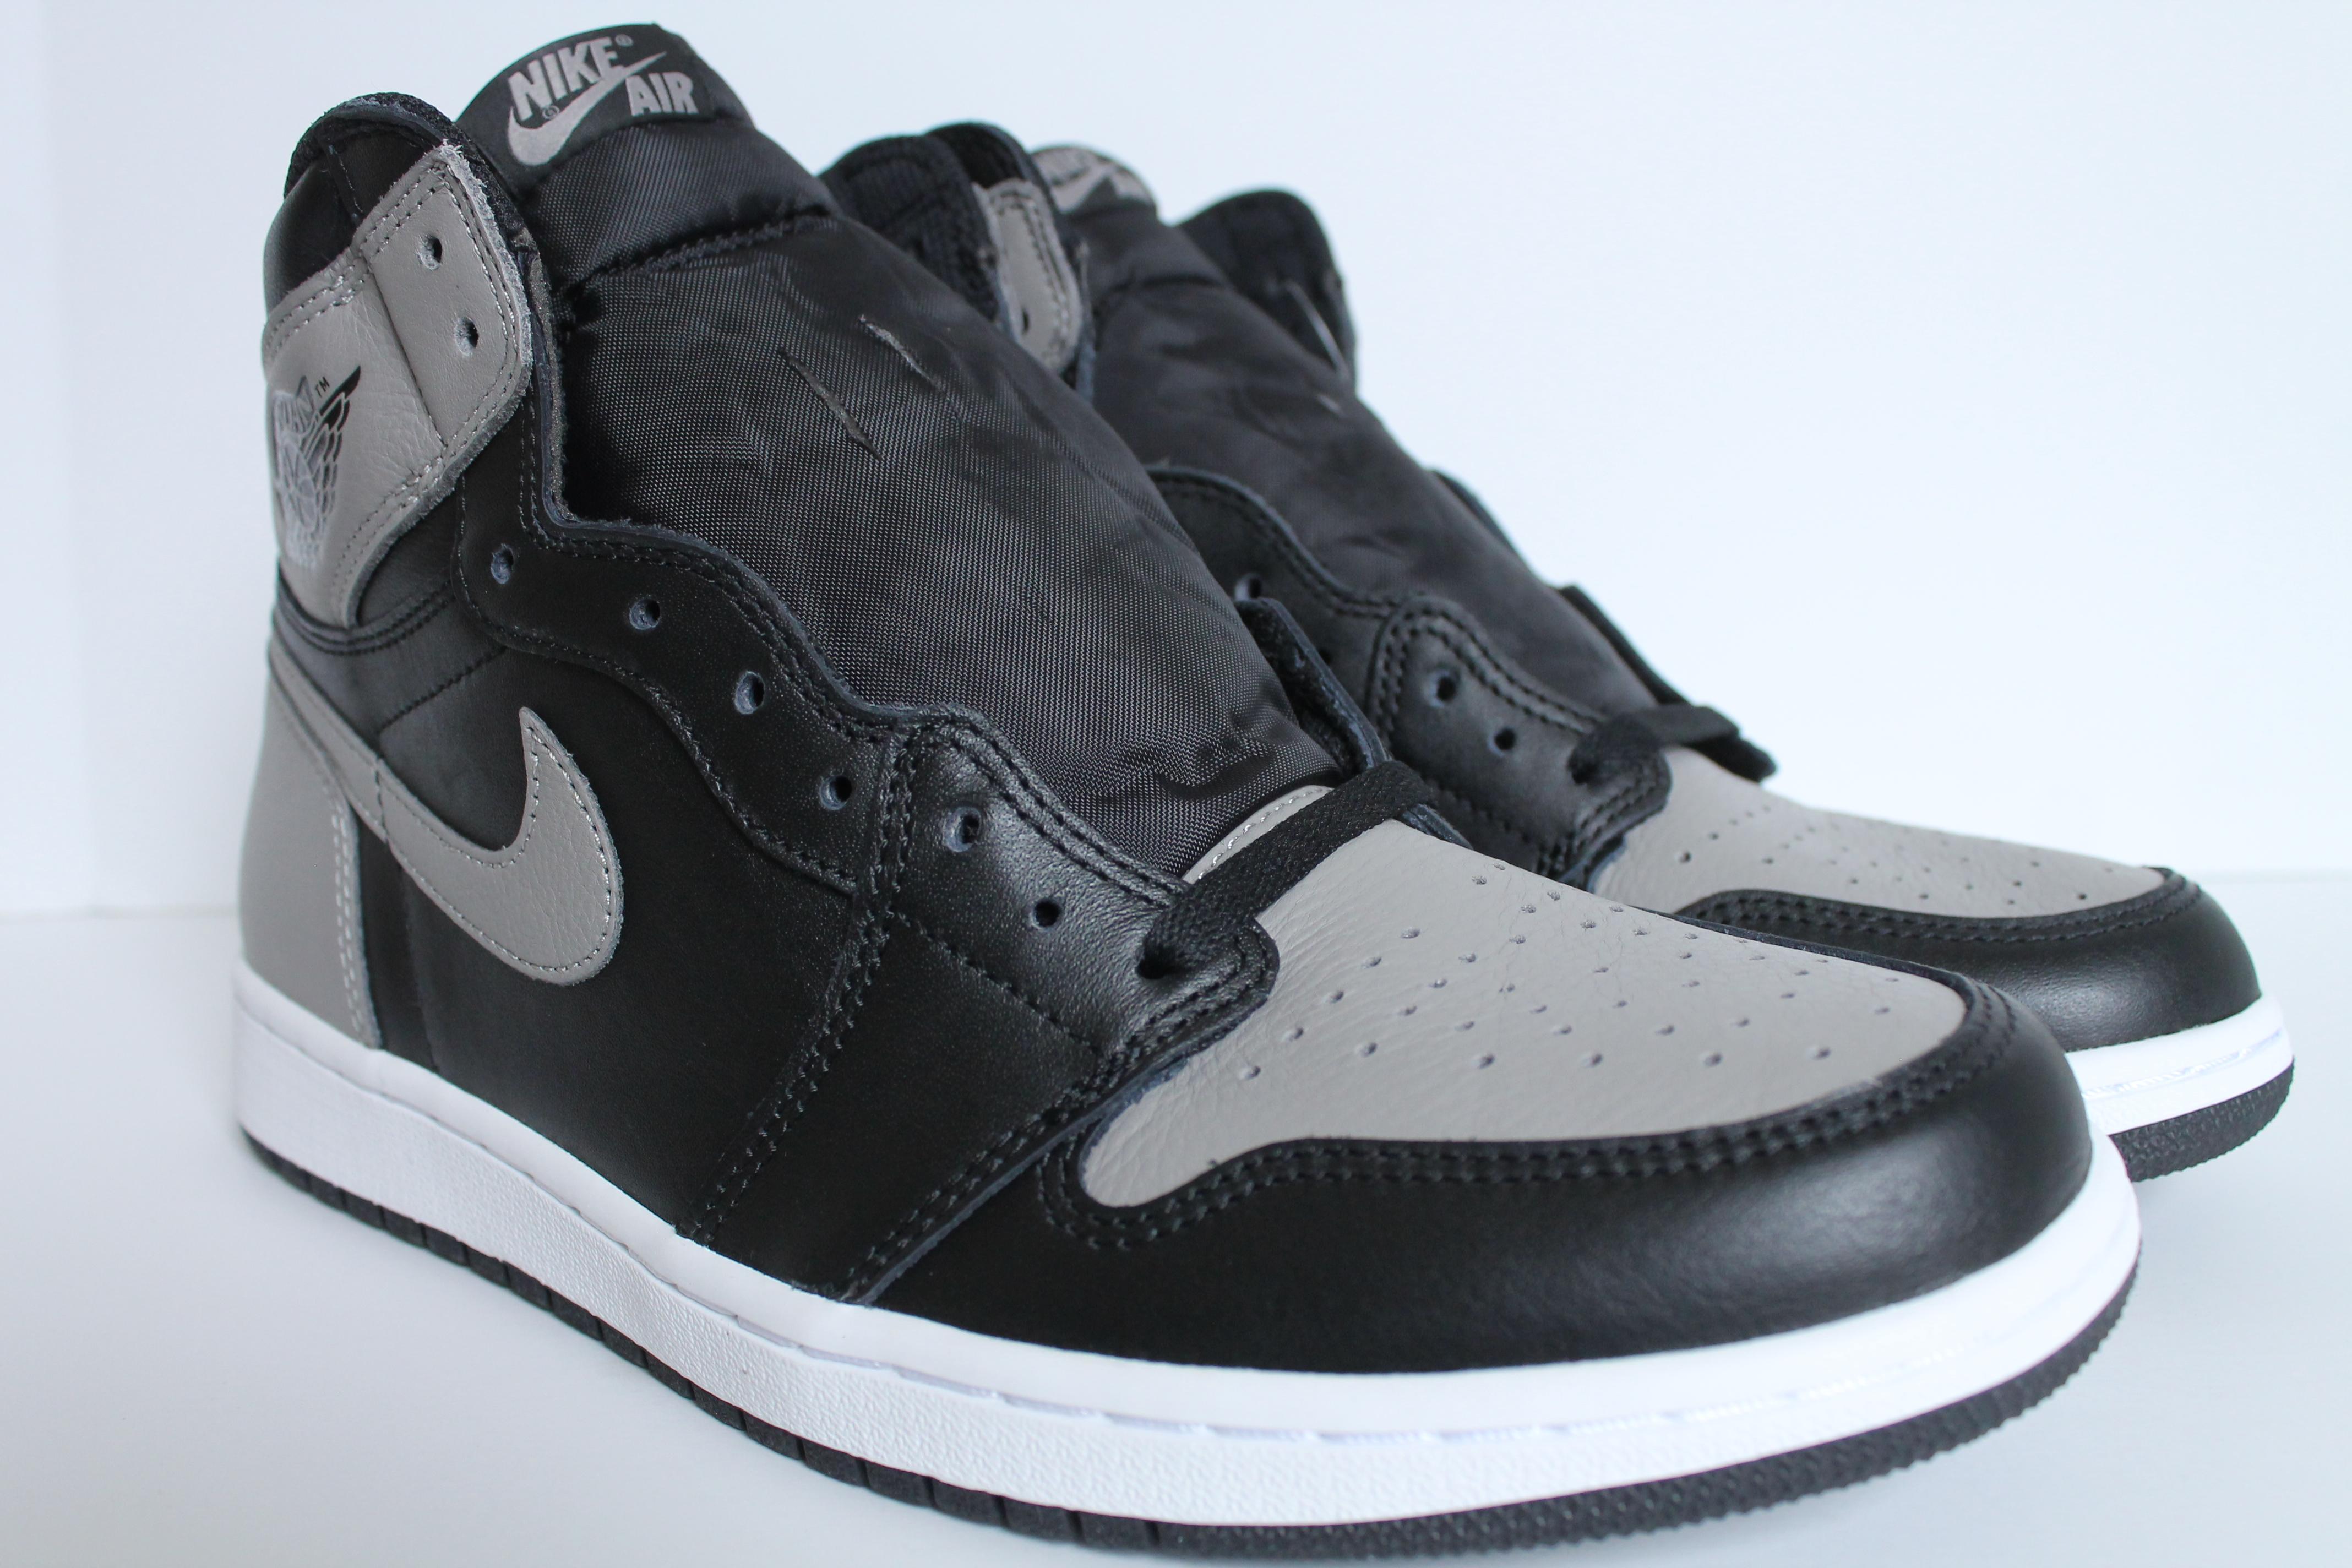 on sale fac46 46033 ... Air Jordan 1 Retro High OG Shadow ...